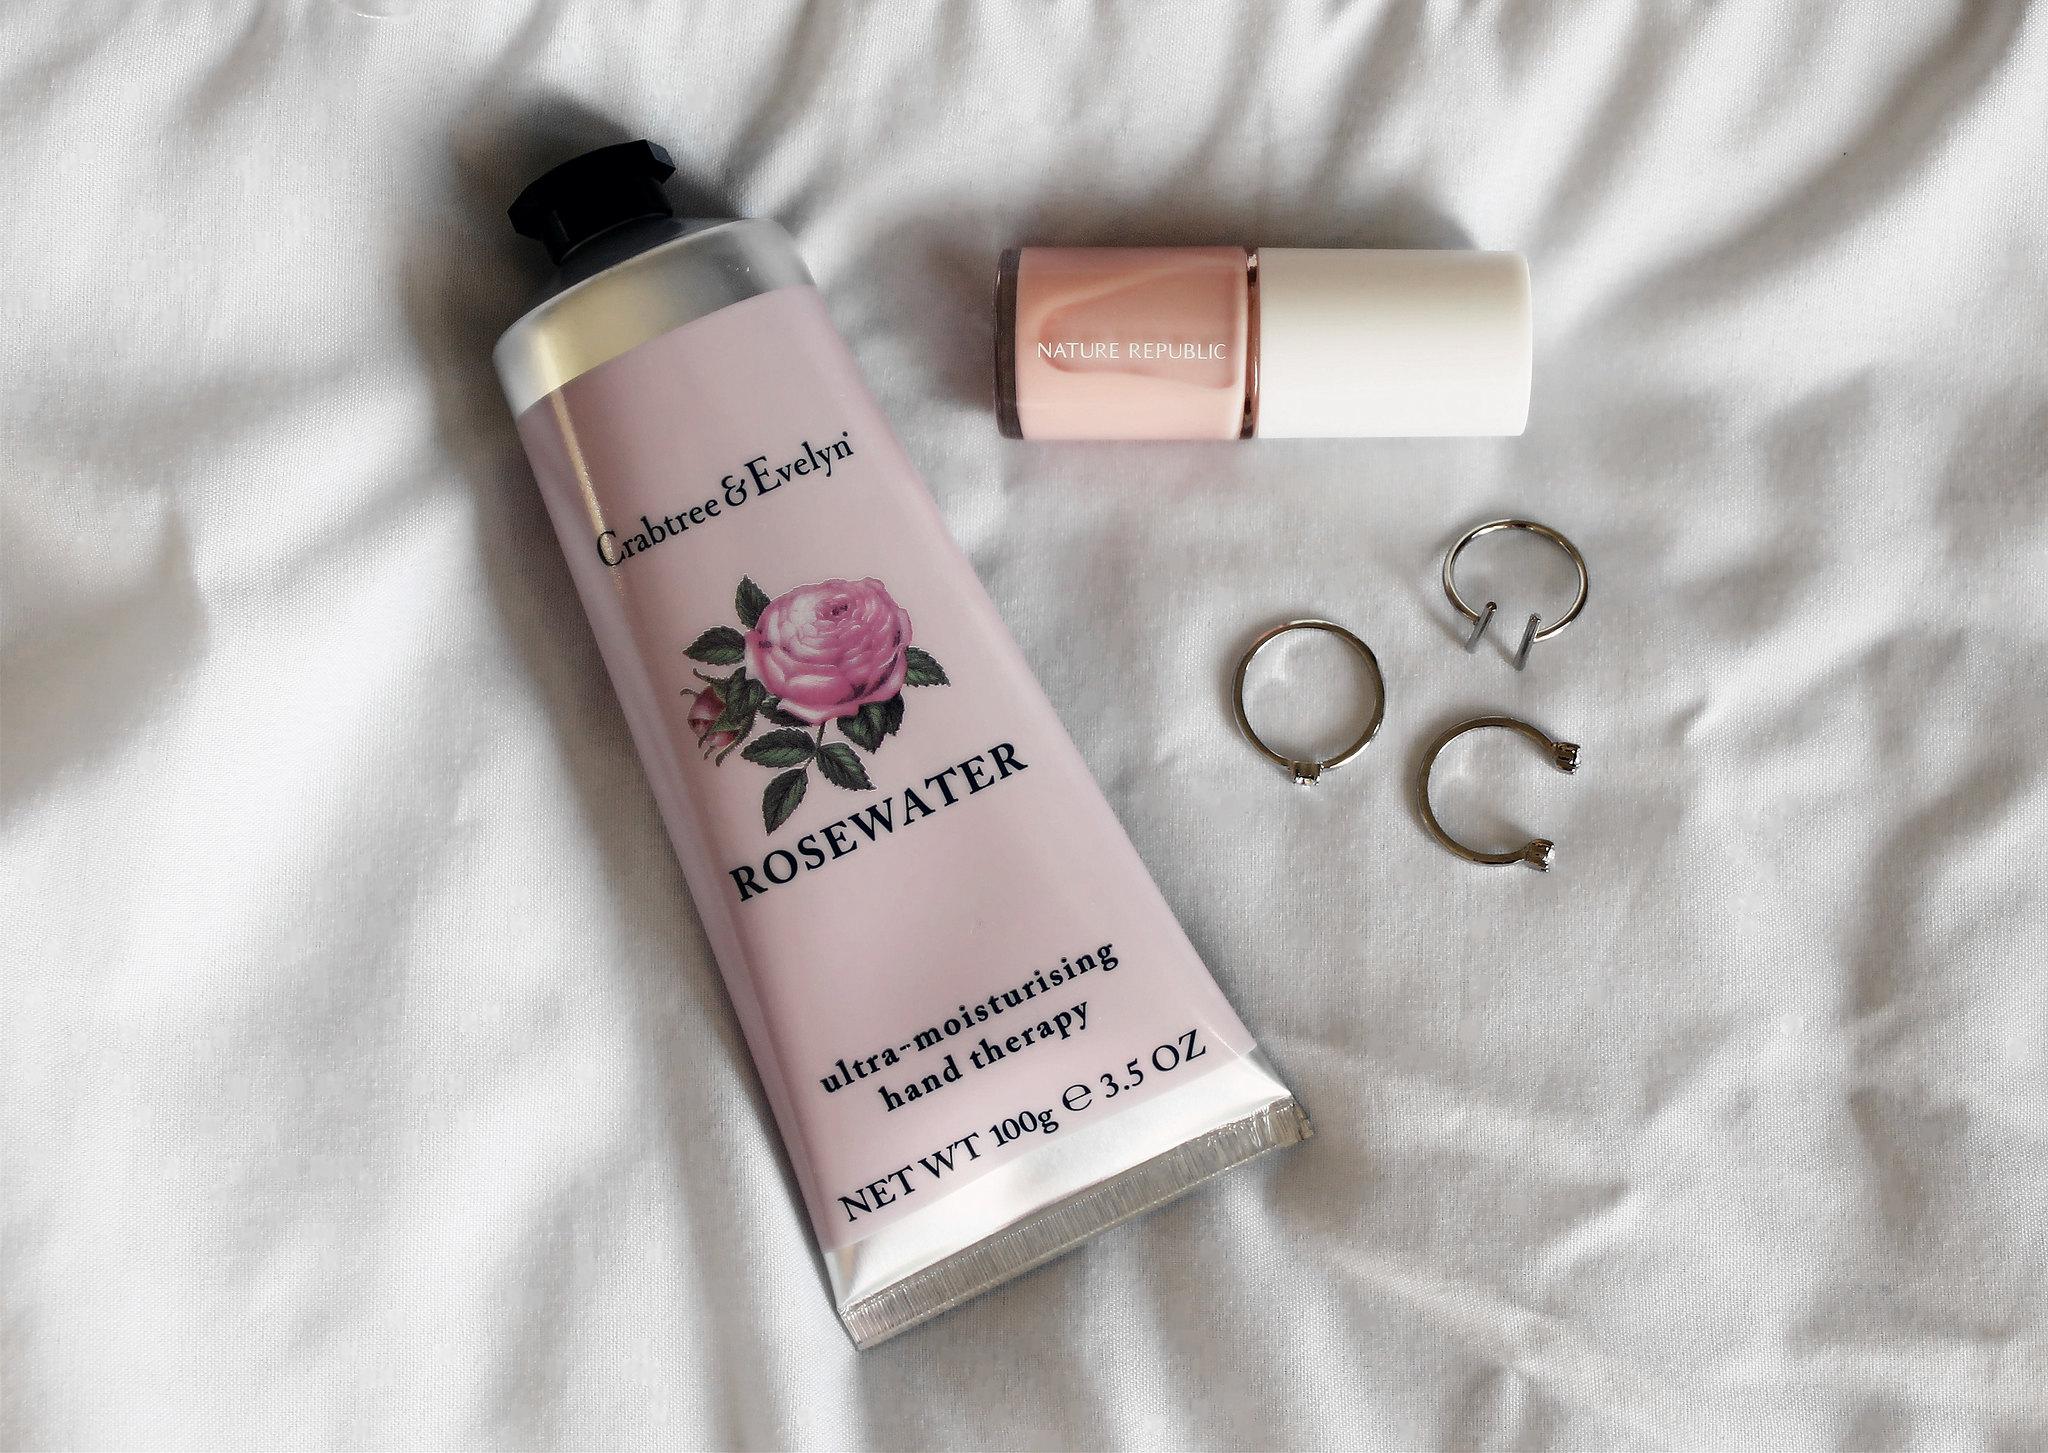 2793-nature-republic-nail-polish-cotton-candy-pink-korean-cosmetics